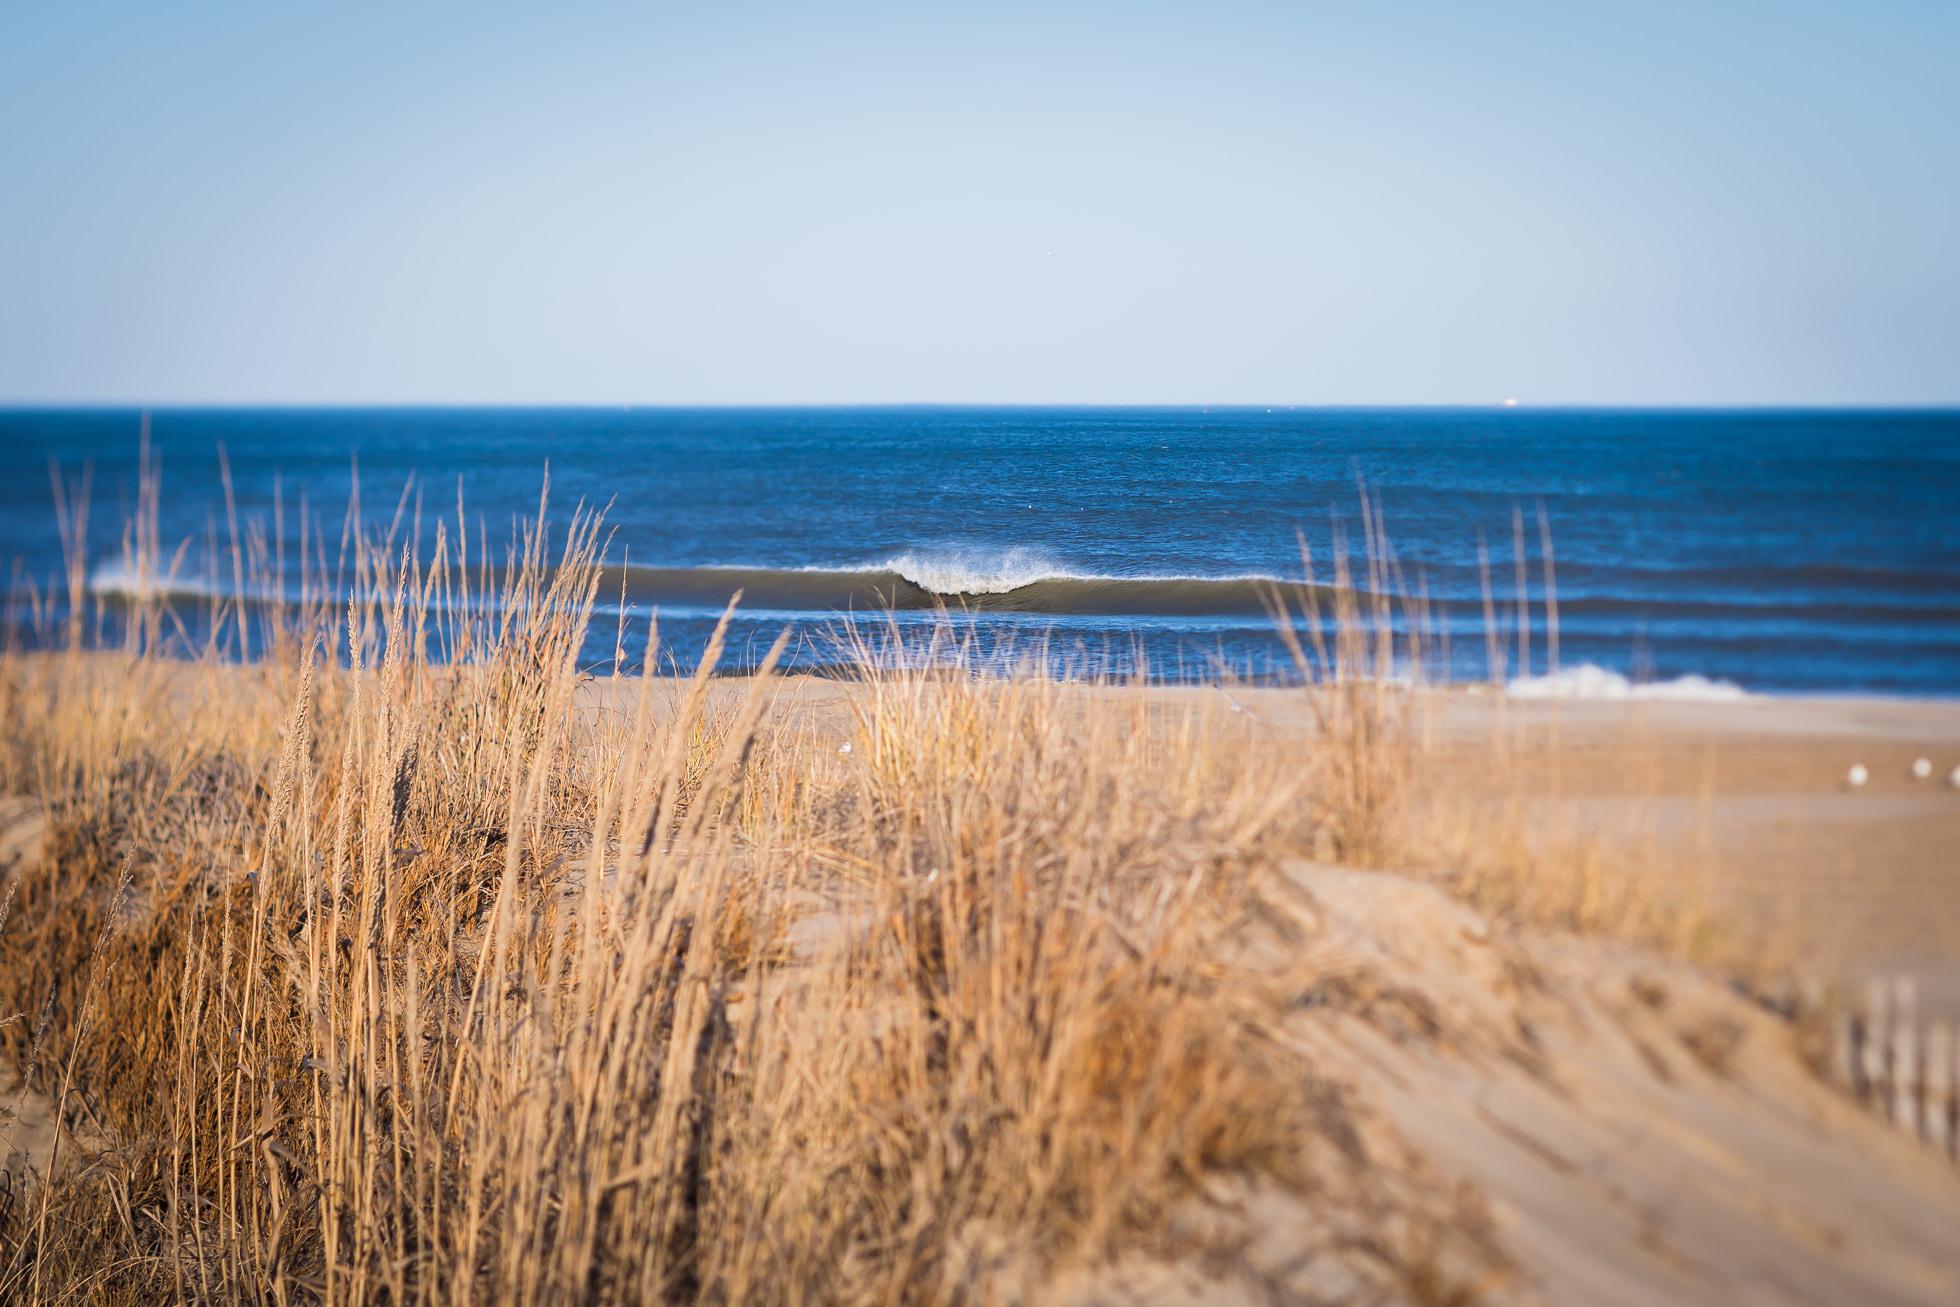 wave, beach, virginia beach photography, nature photographer